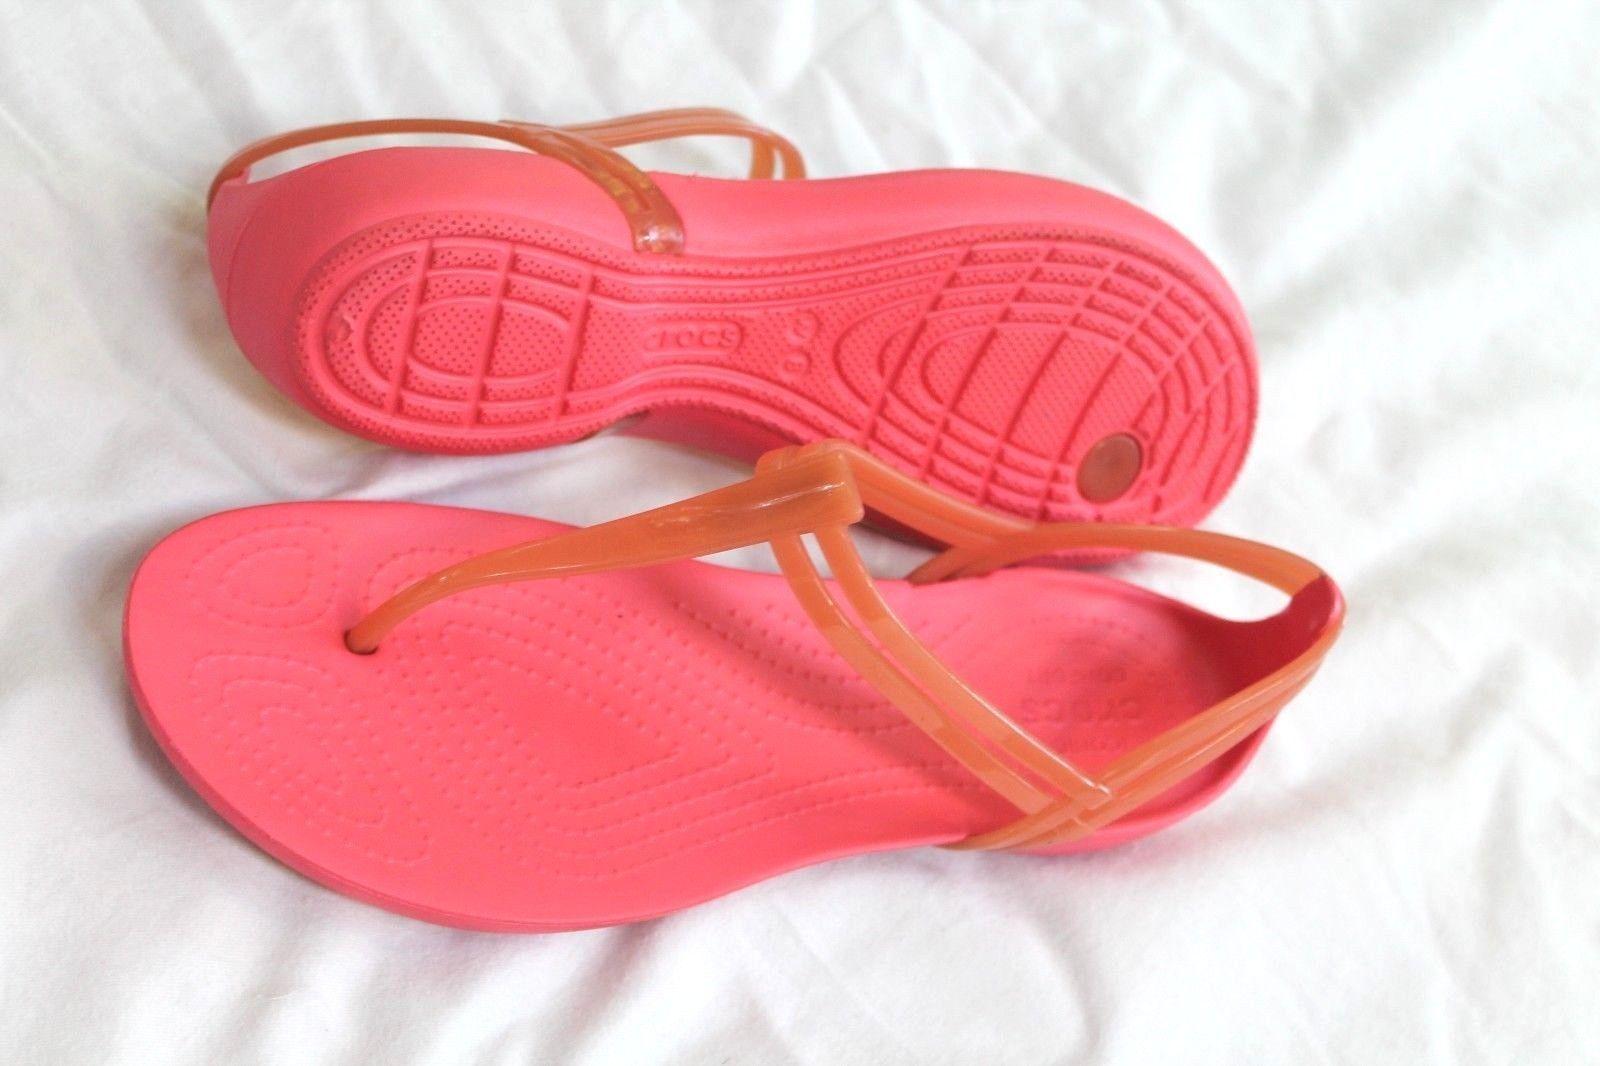 5685318af1cf Crocs Women s Isabella T-Strap Sandals Pink and 50 similar items. S l1600